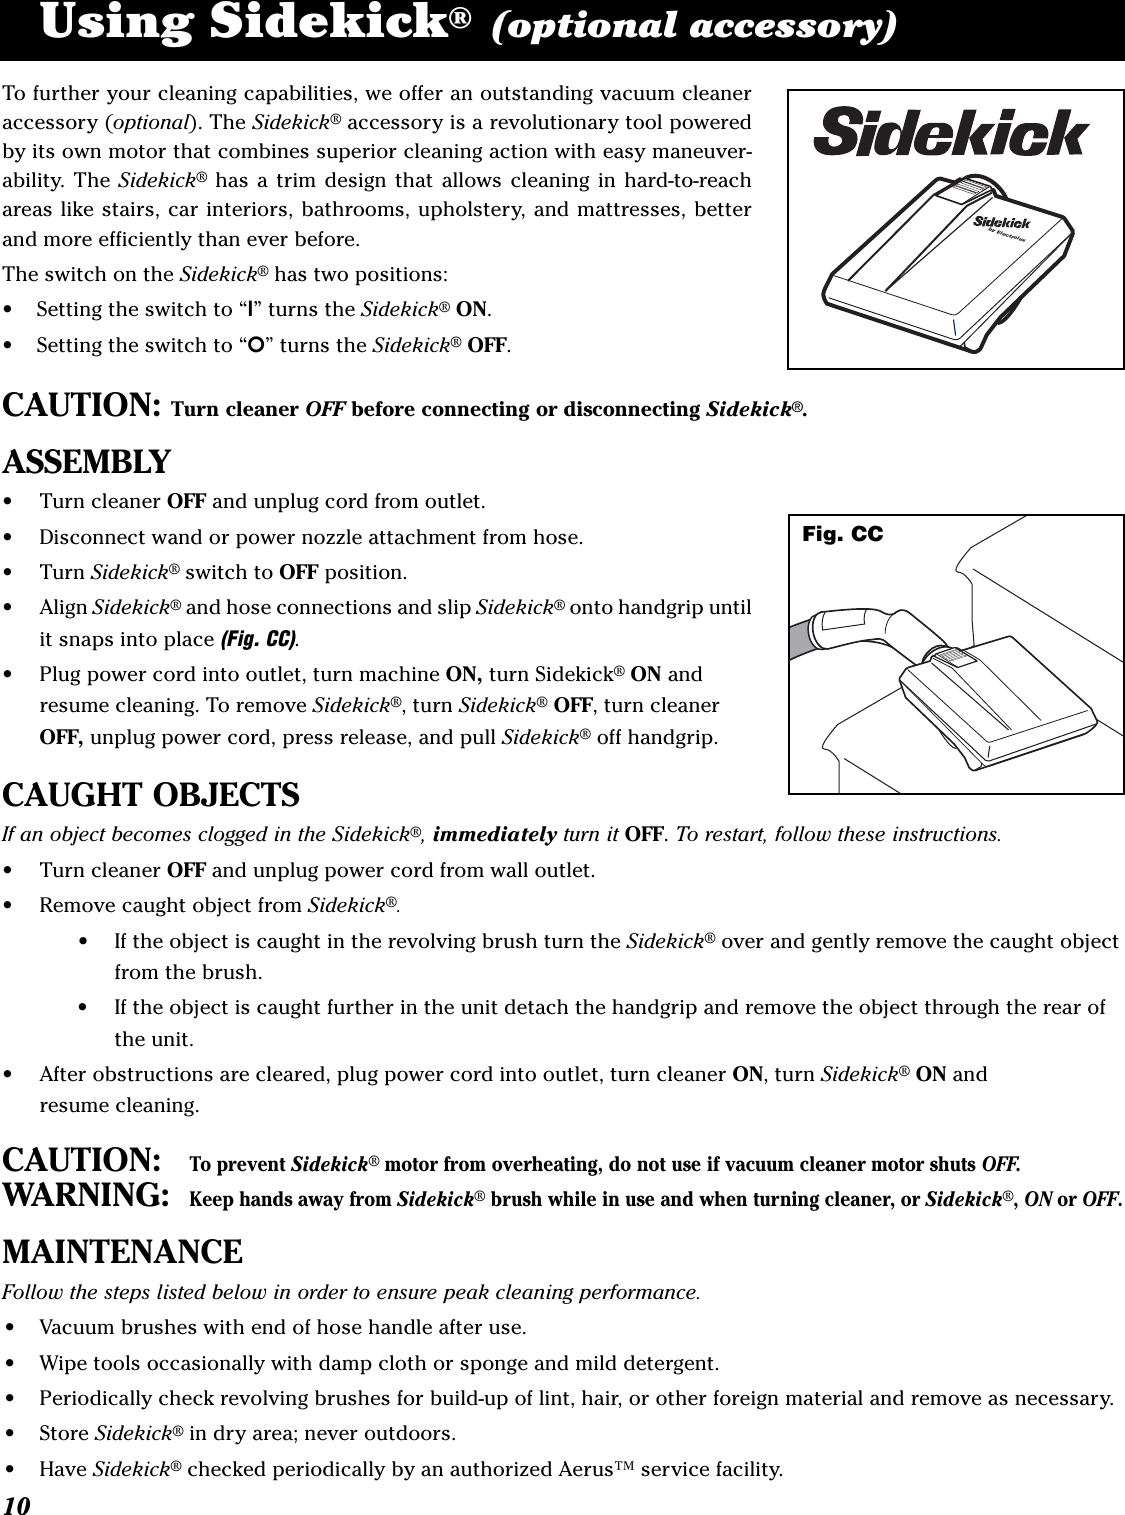 Electrolux 2100 Instruction Manual ManualsLib Makes It Easy